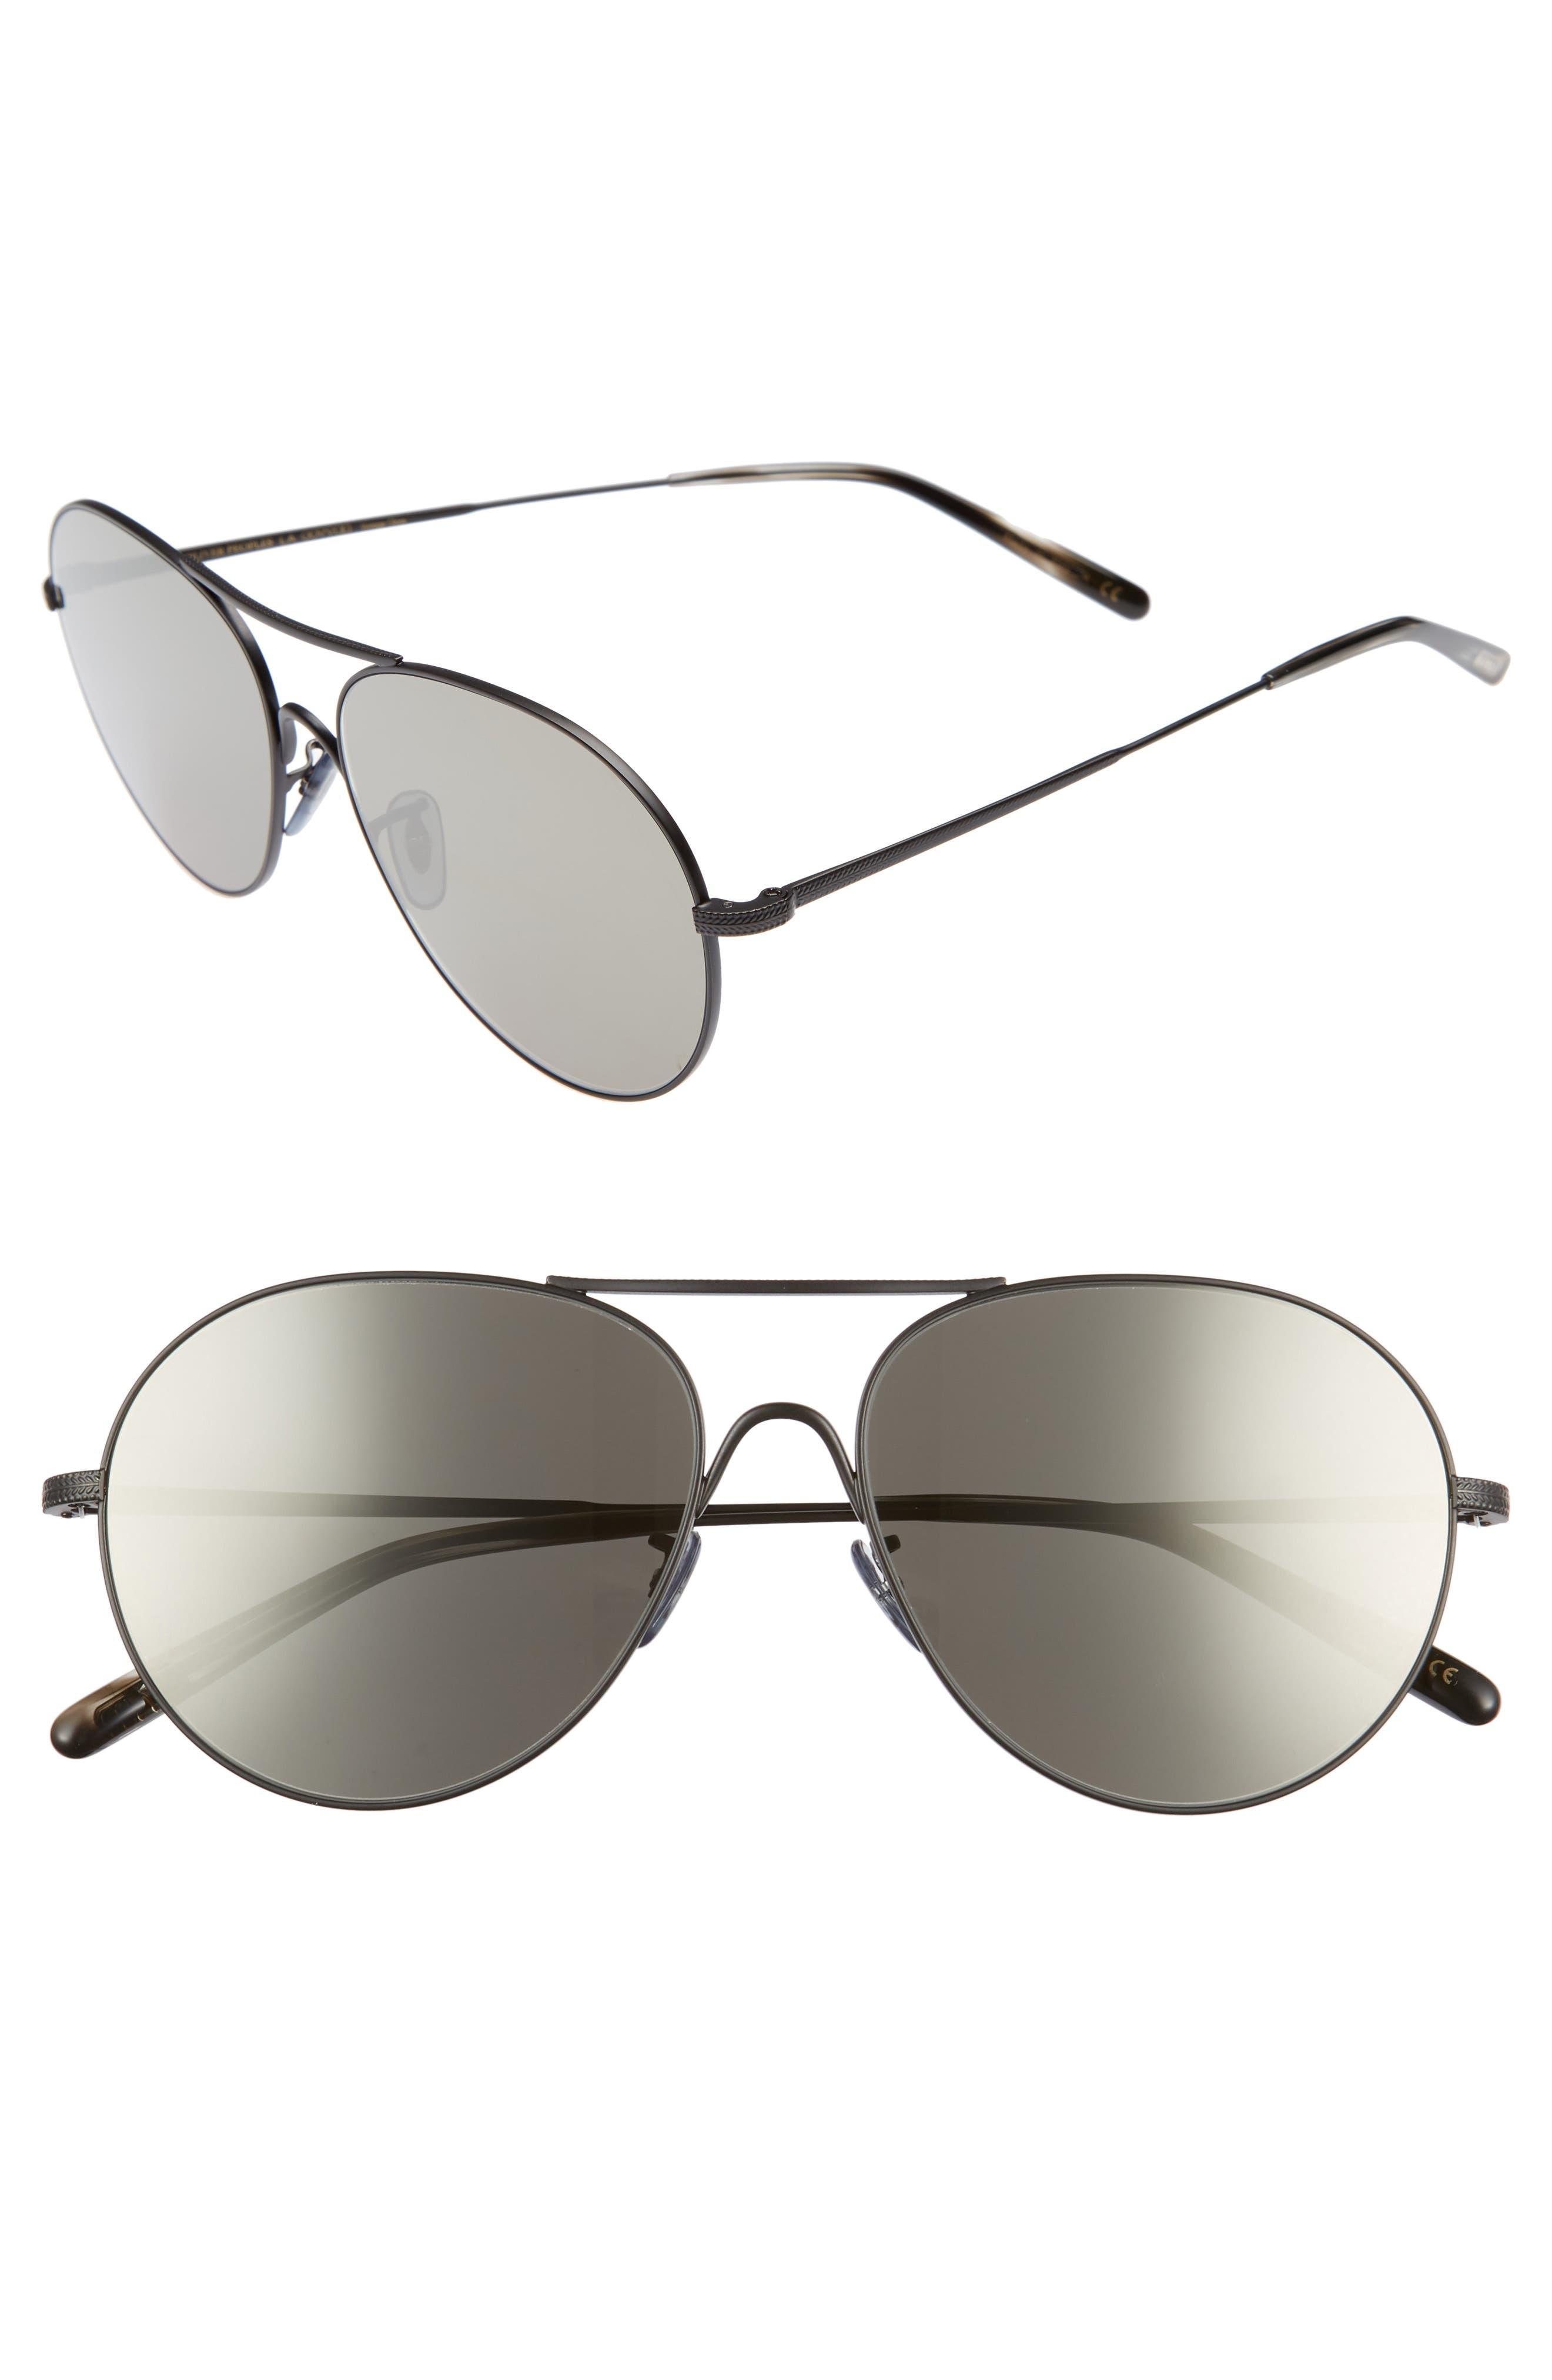 Rockmore 58mm Aviator Sunglasses,                             Main thumbnail 1, color,                             GREY